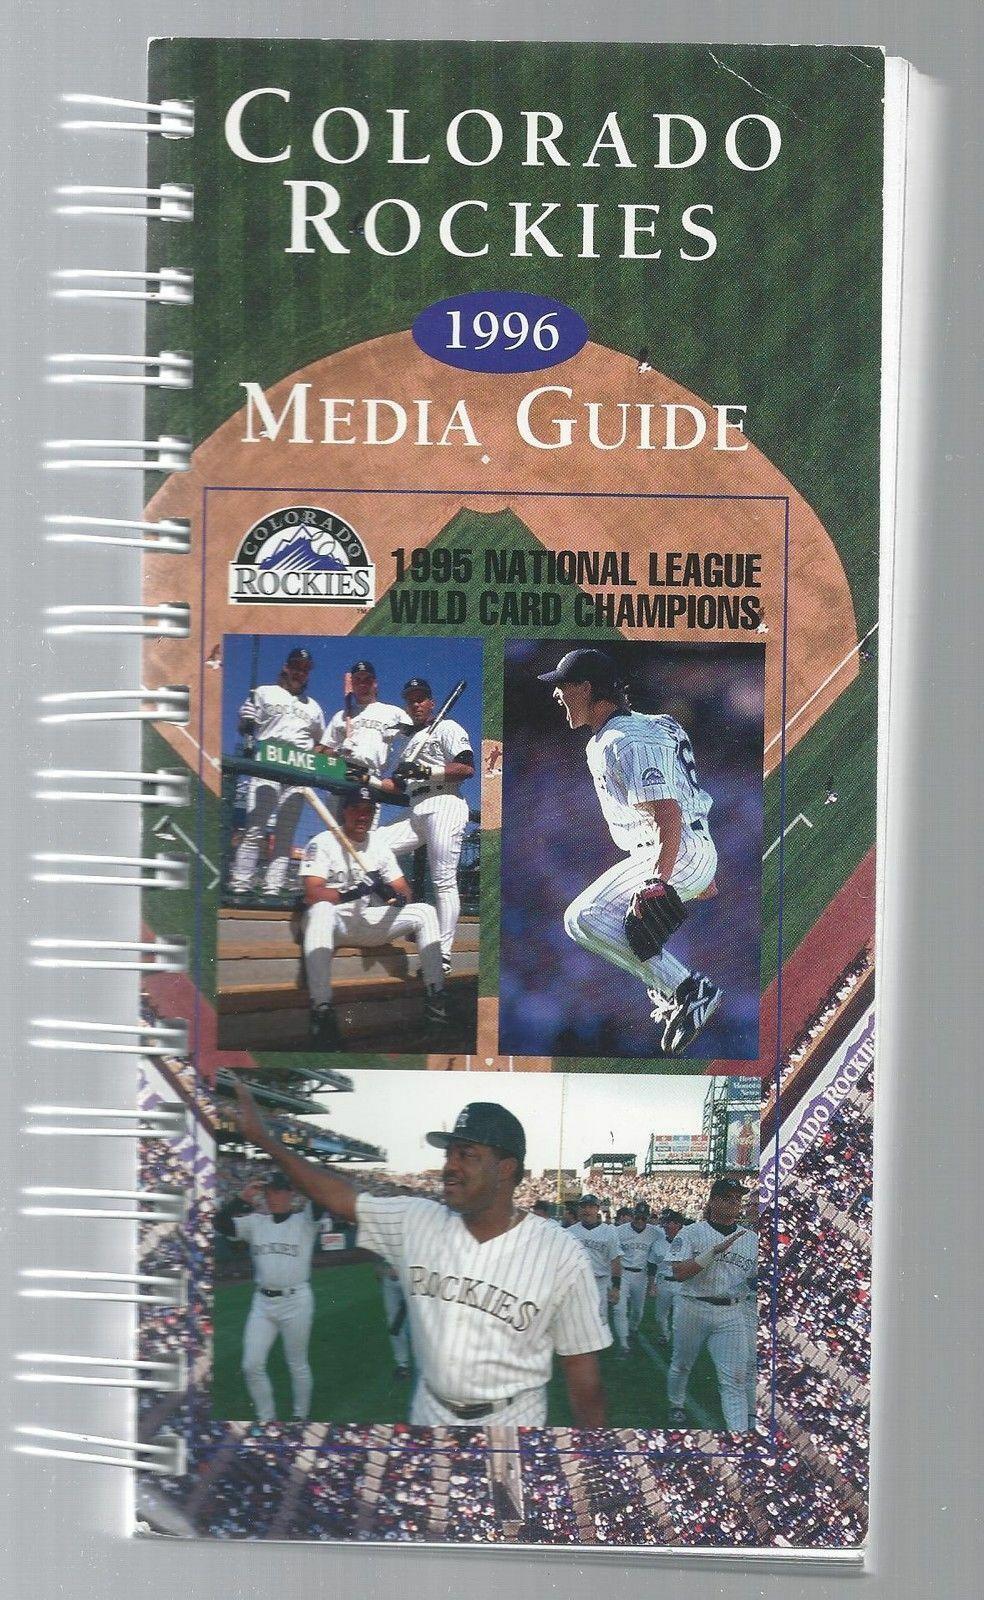 1996 Colorado Rockies Baseball MLB Media Guide - Annual Player Info spiral